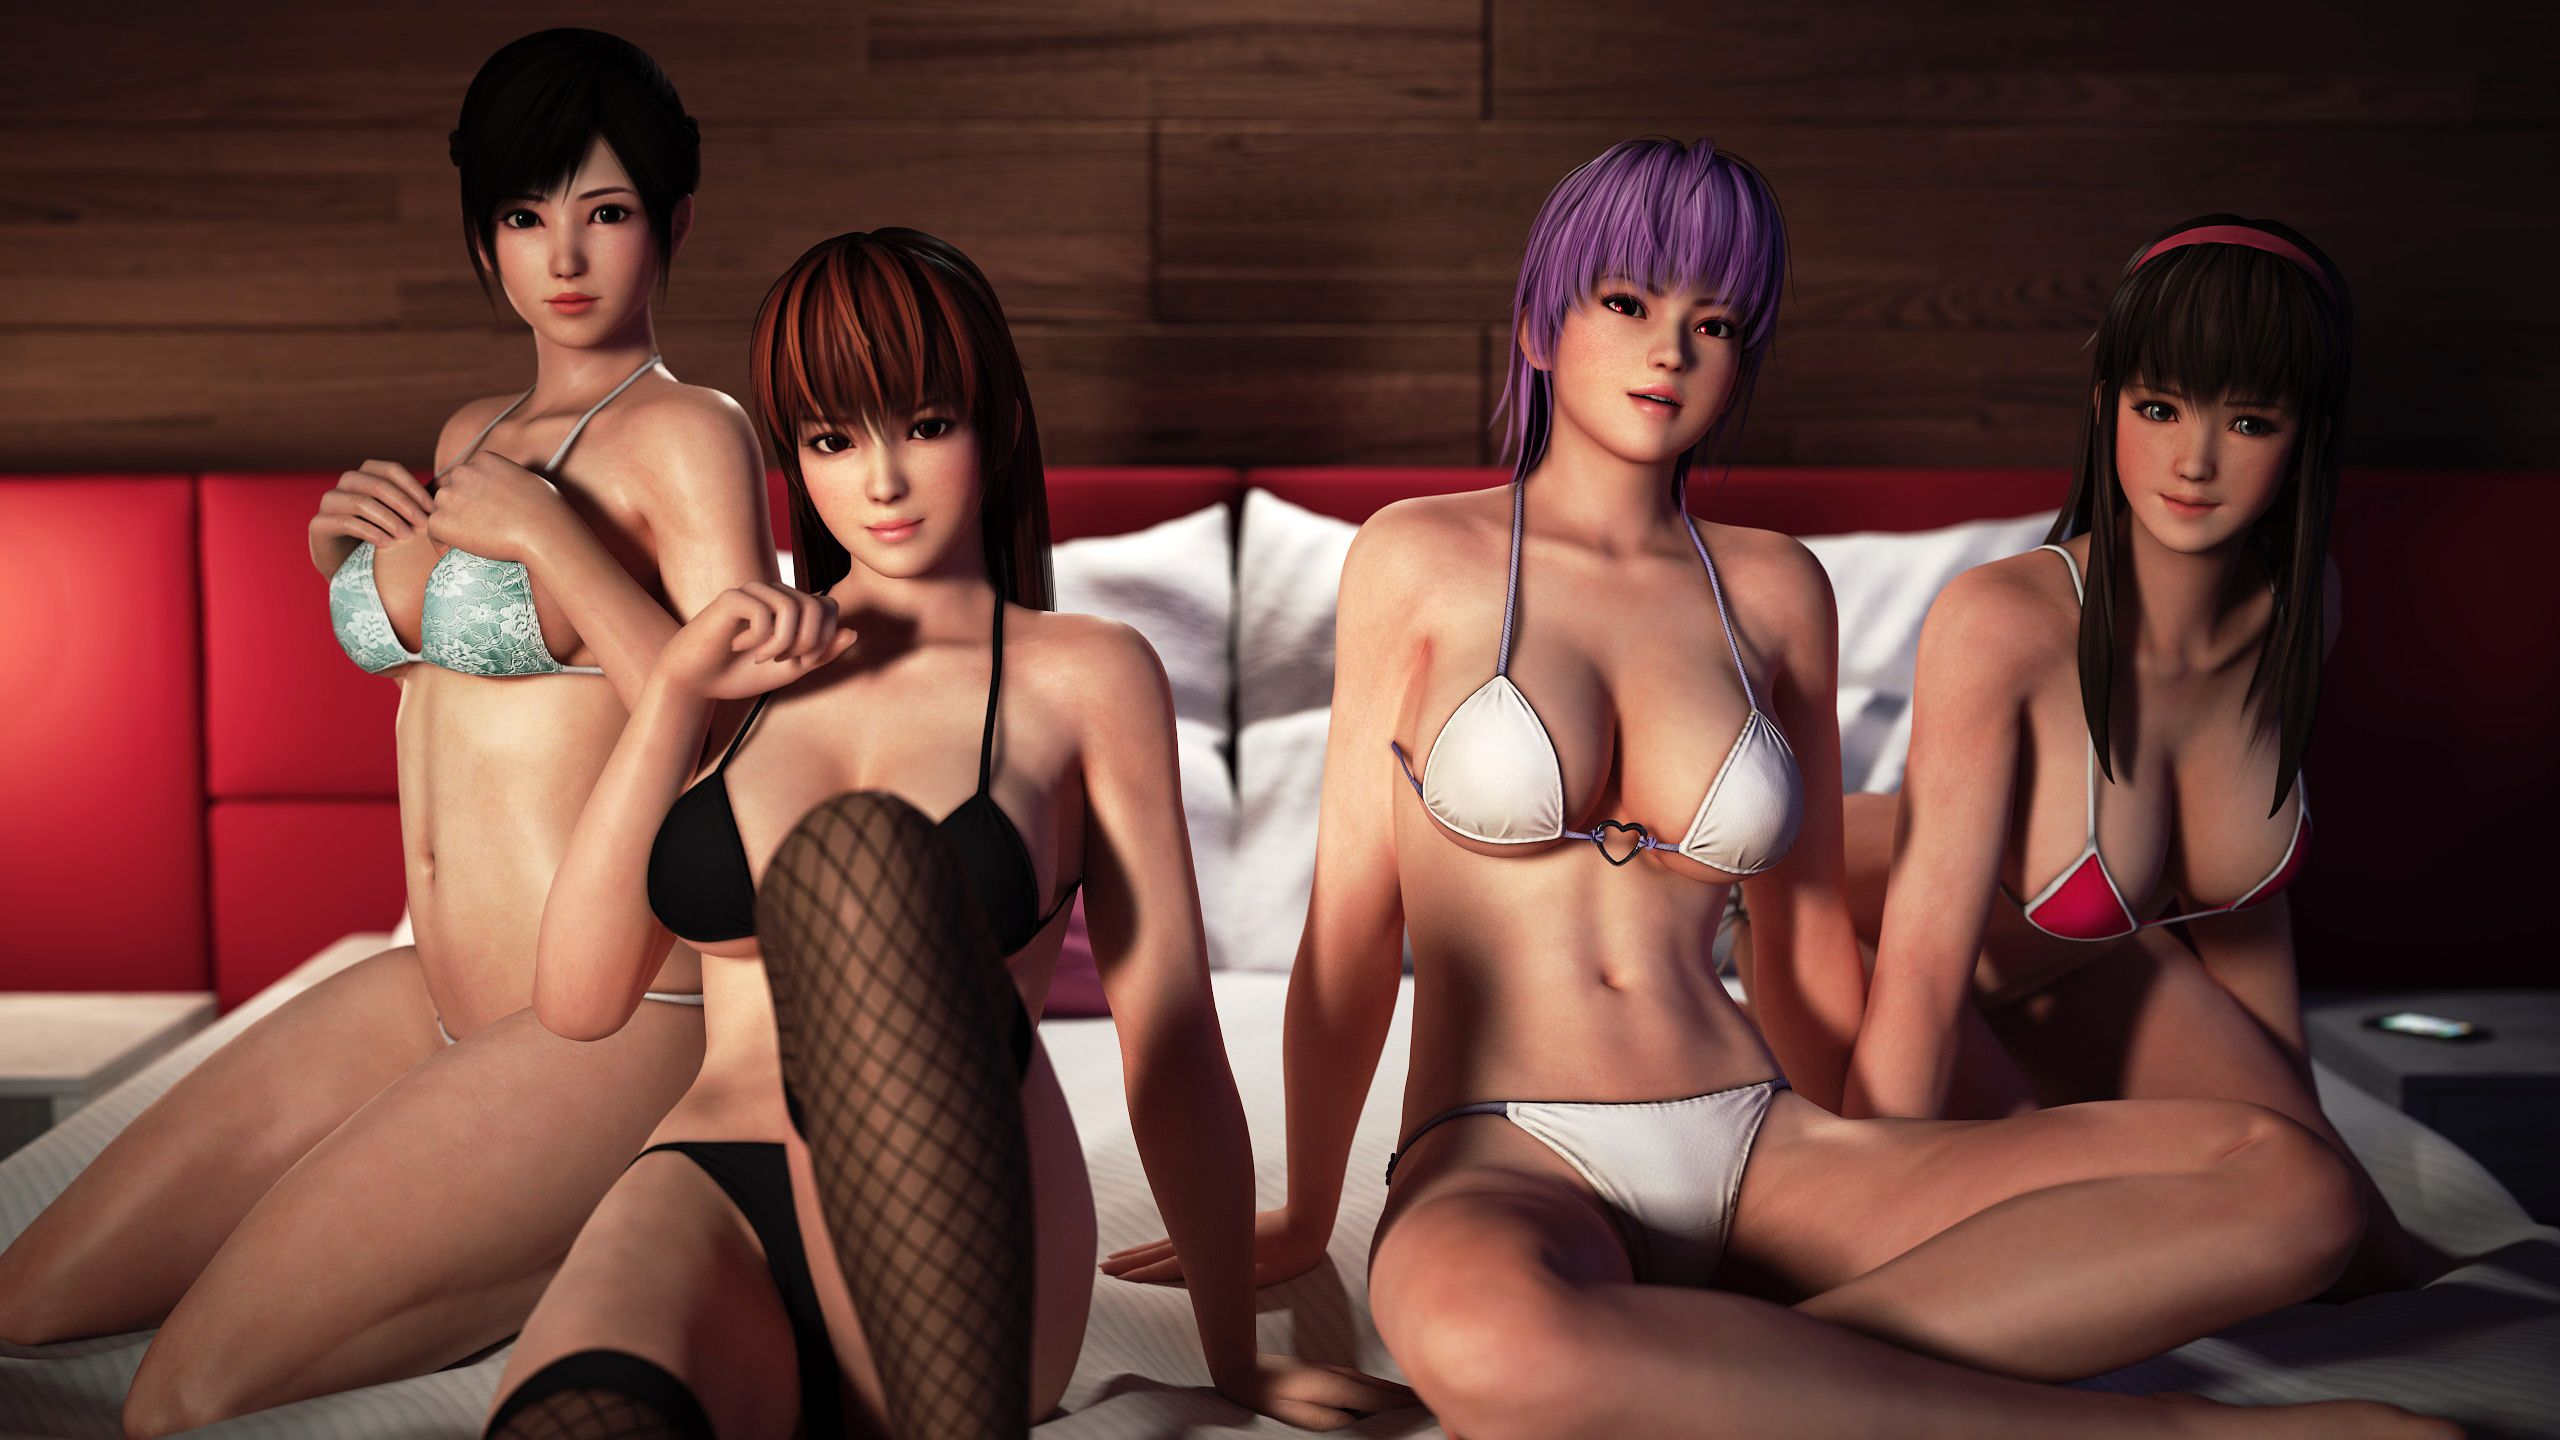 Doa sexy girls, asian bondage sex videos